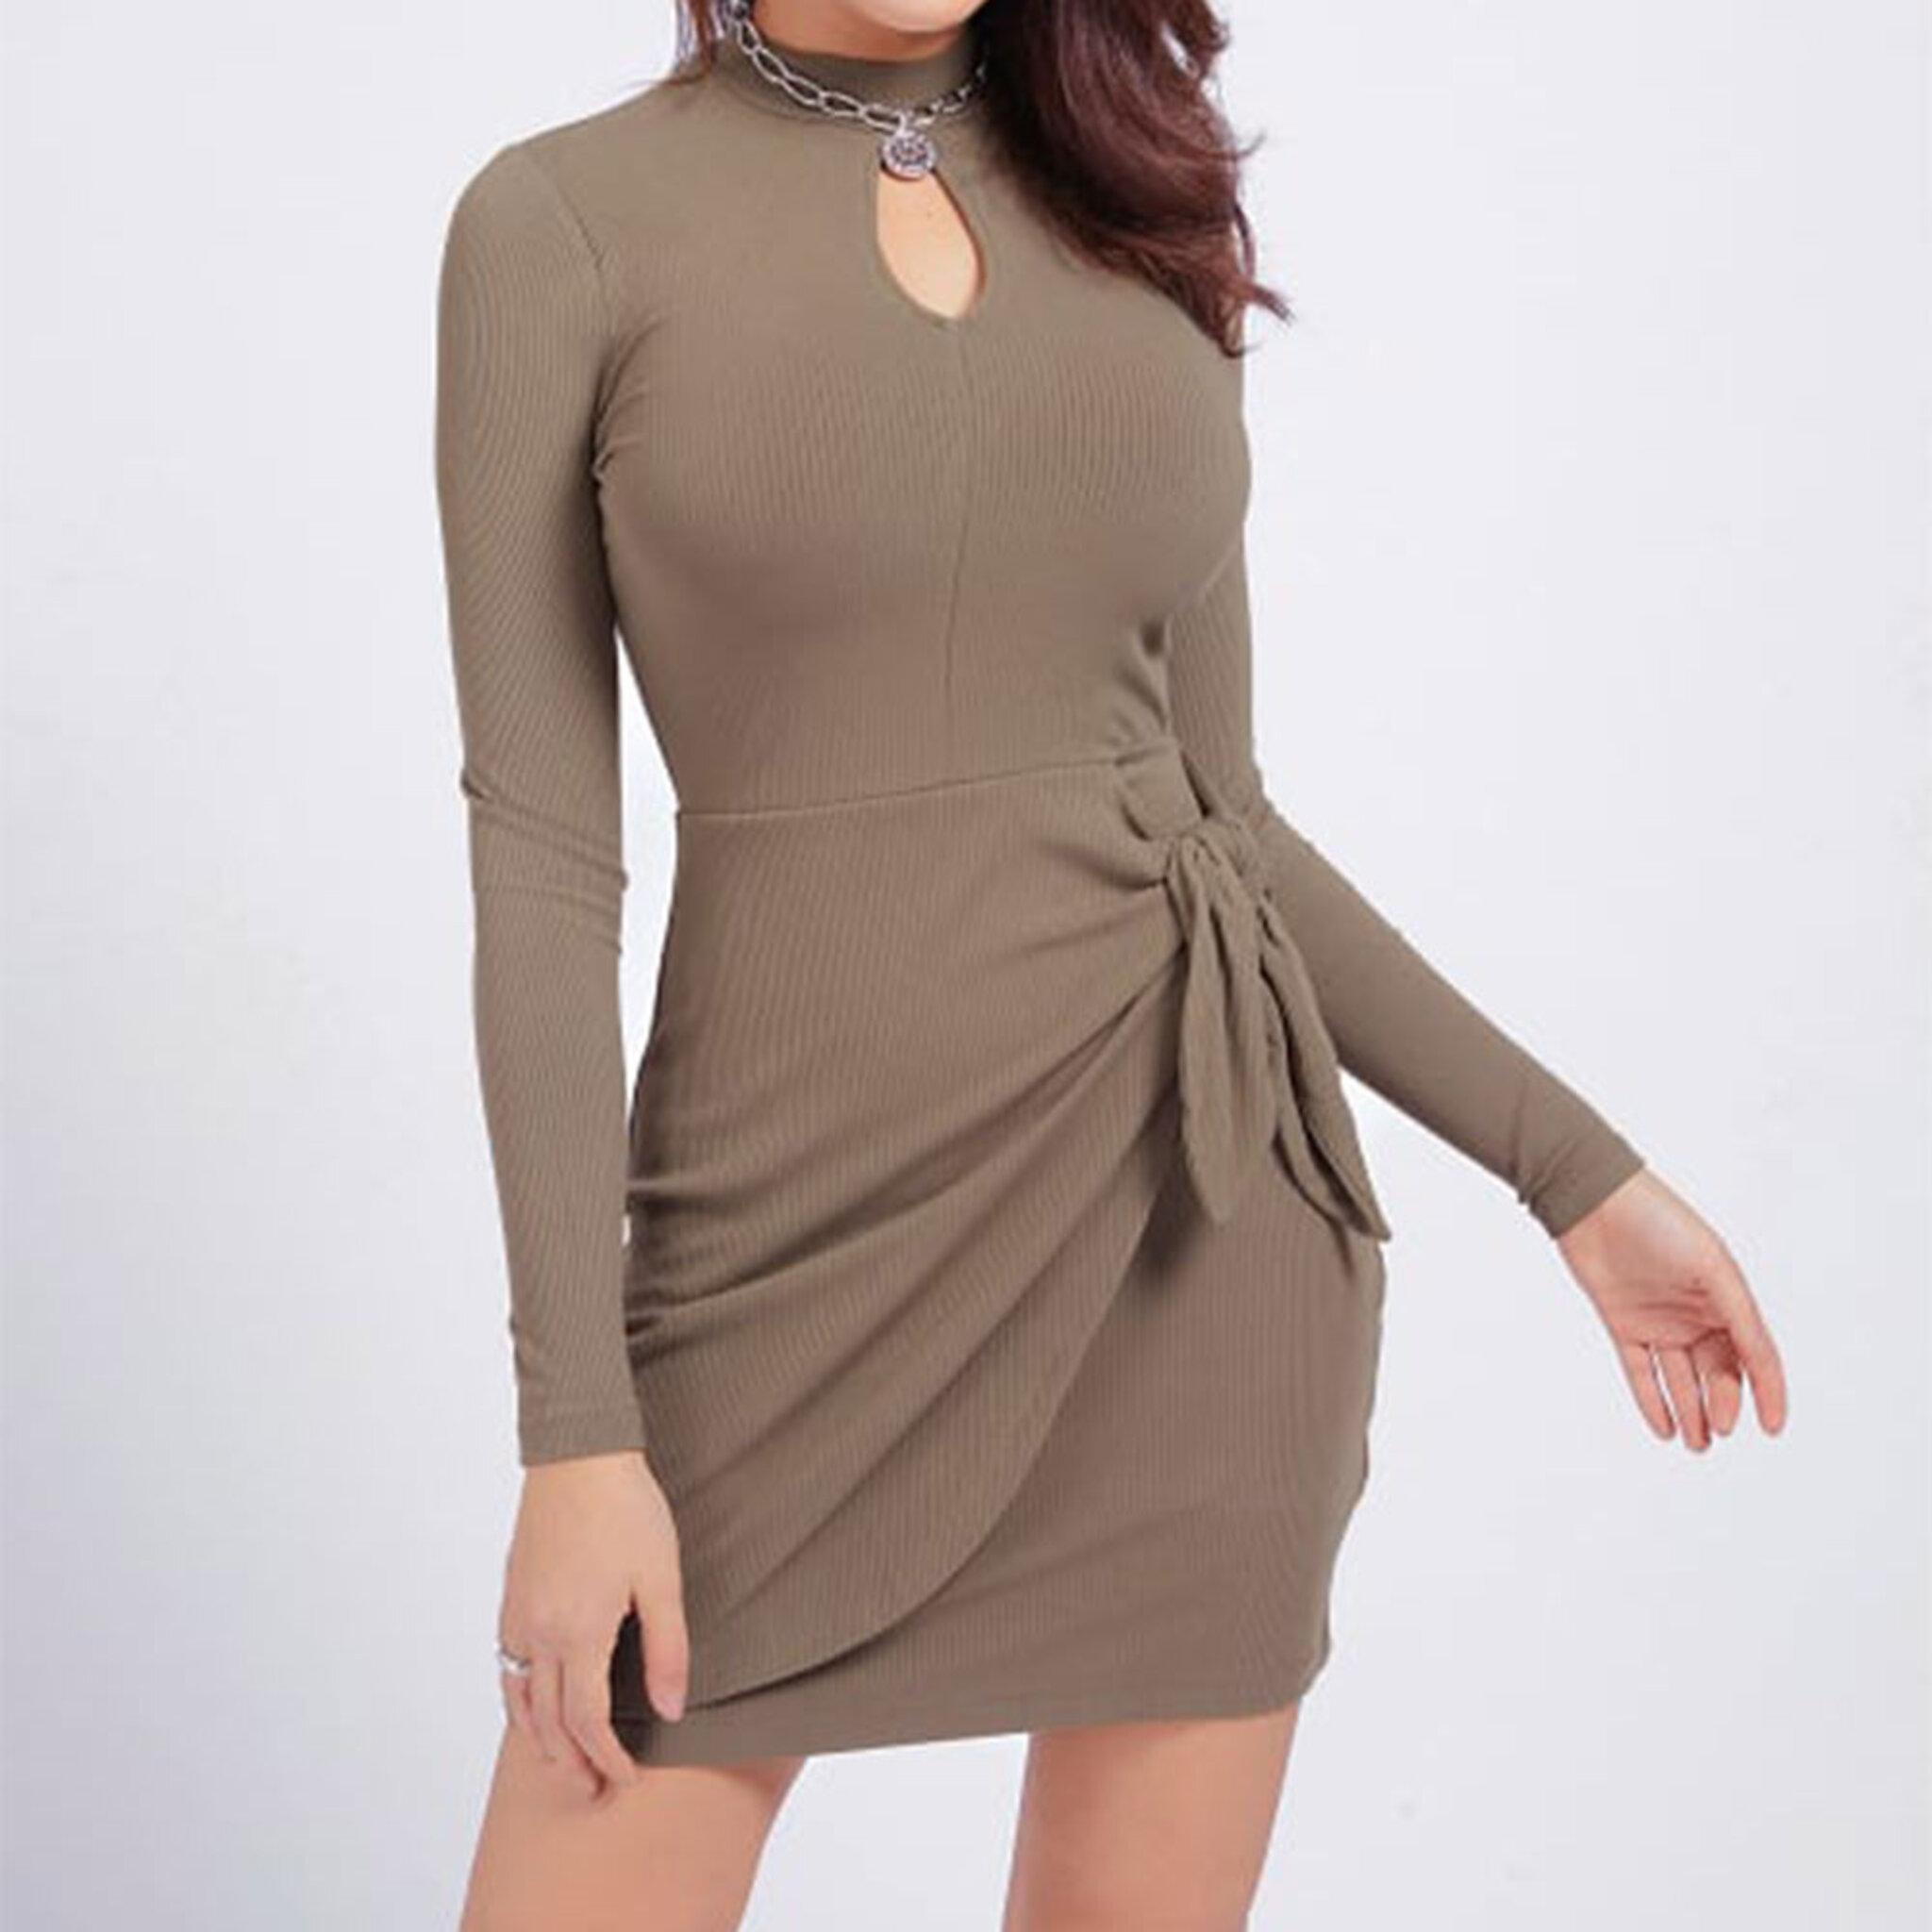 NURSELI DRESS Dress